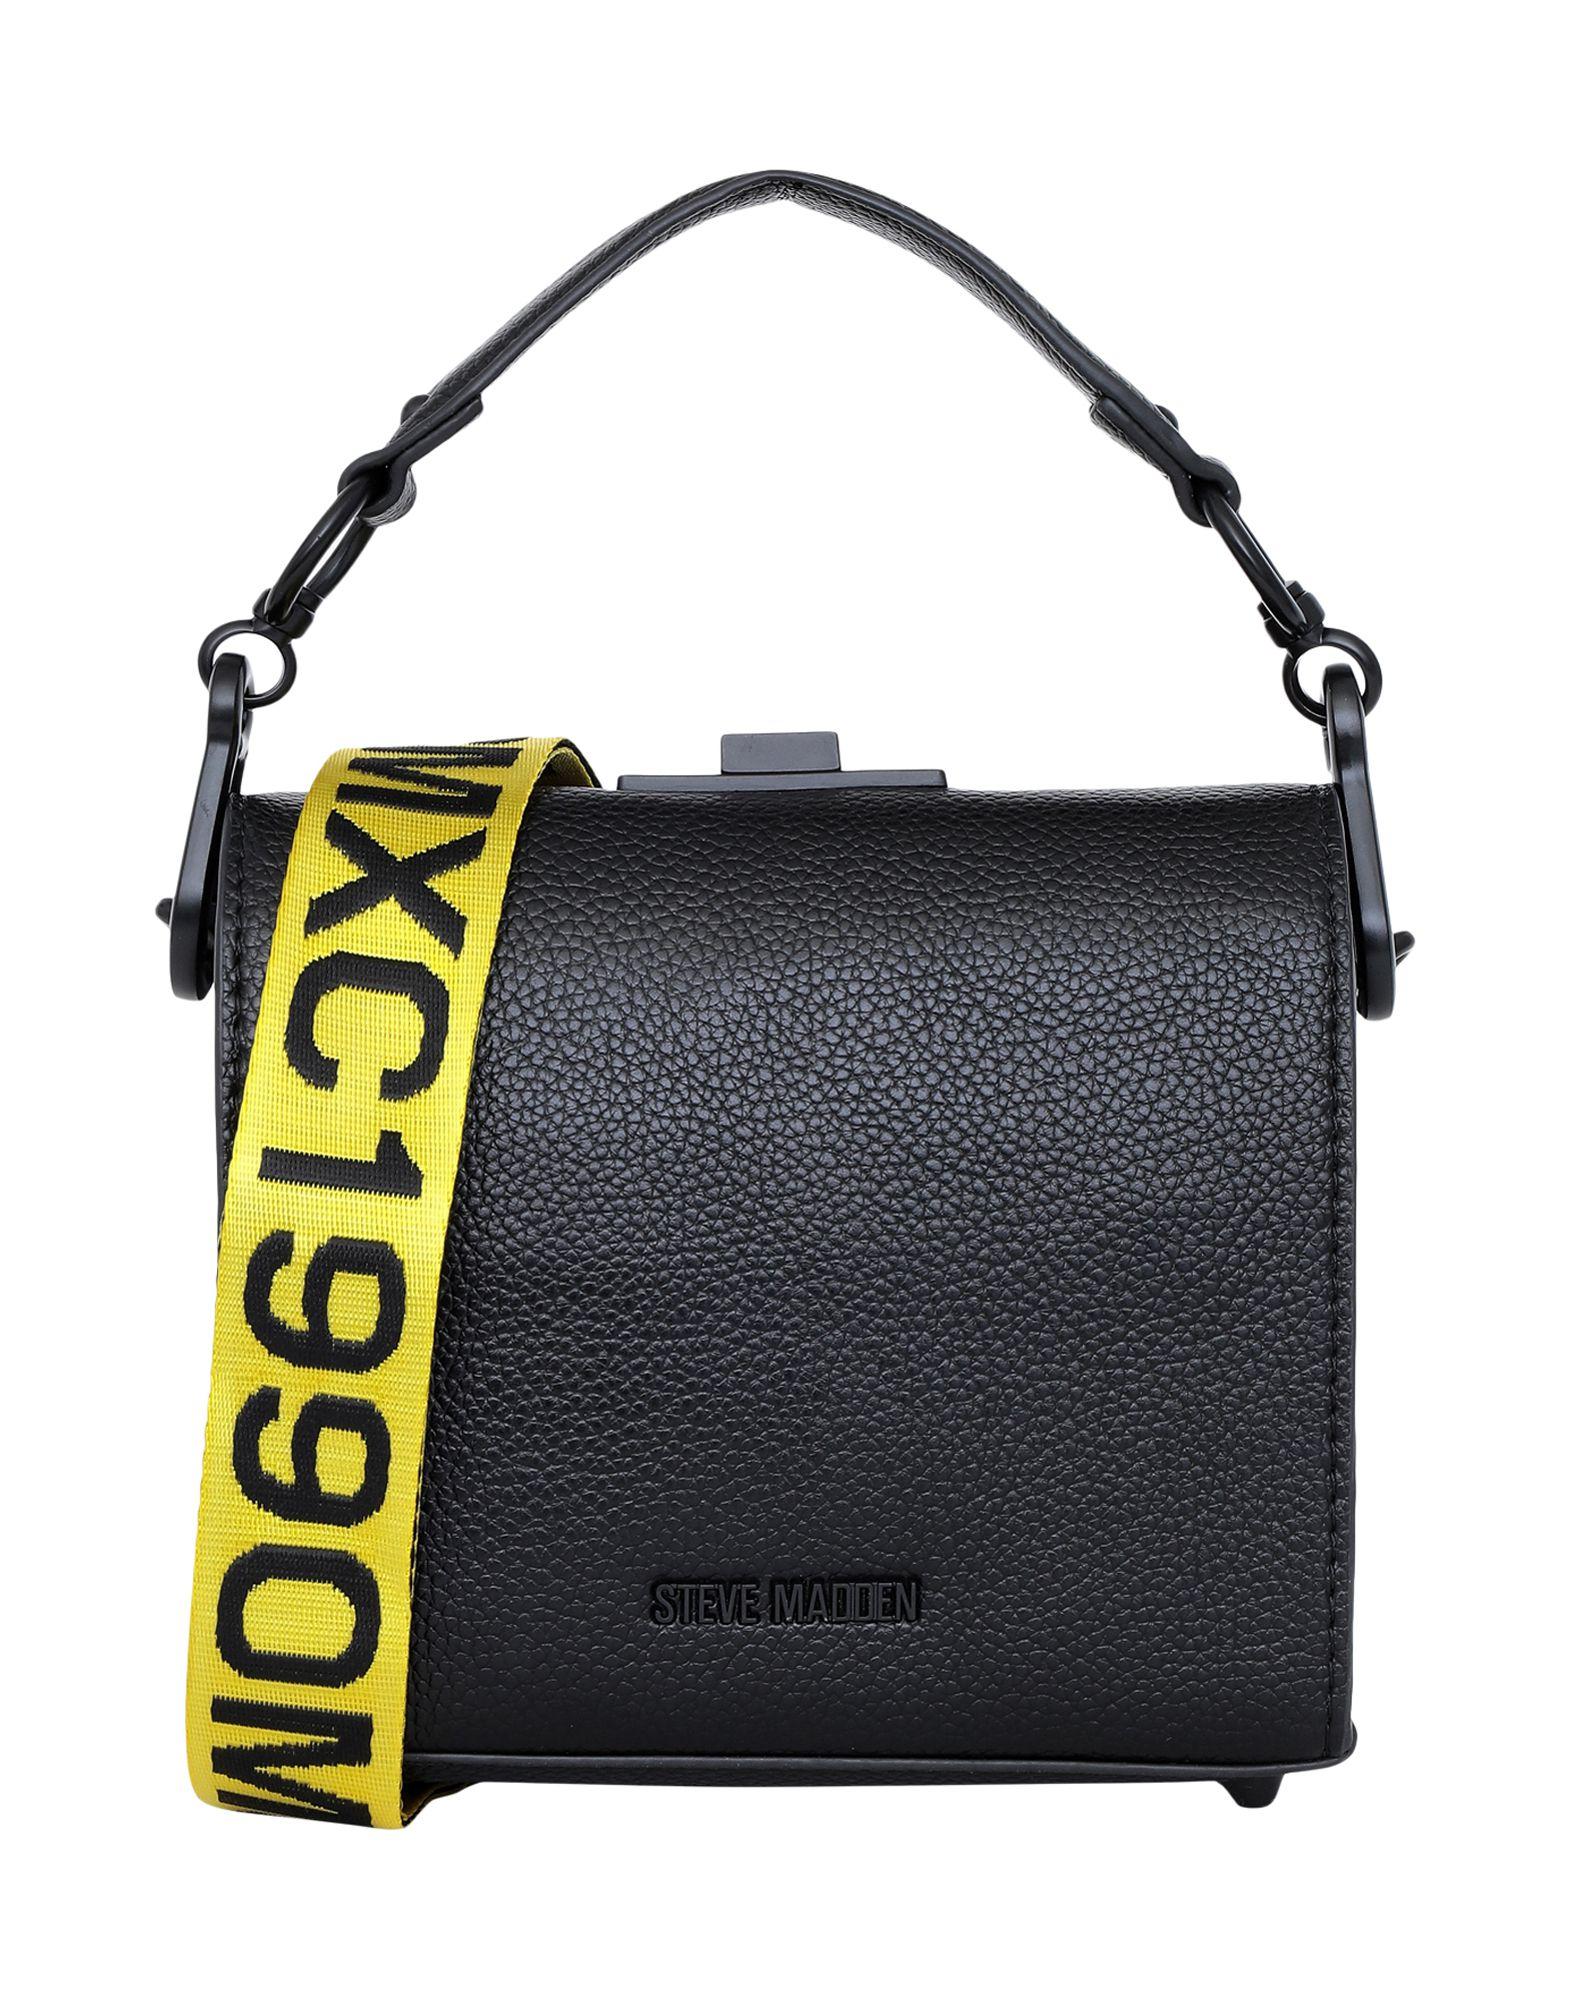 Steve Madden Bkween - Handbag - Women Steve Madden Handbags online on YOOX  United States - 45453721MR 8cde41c1ca909